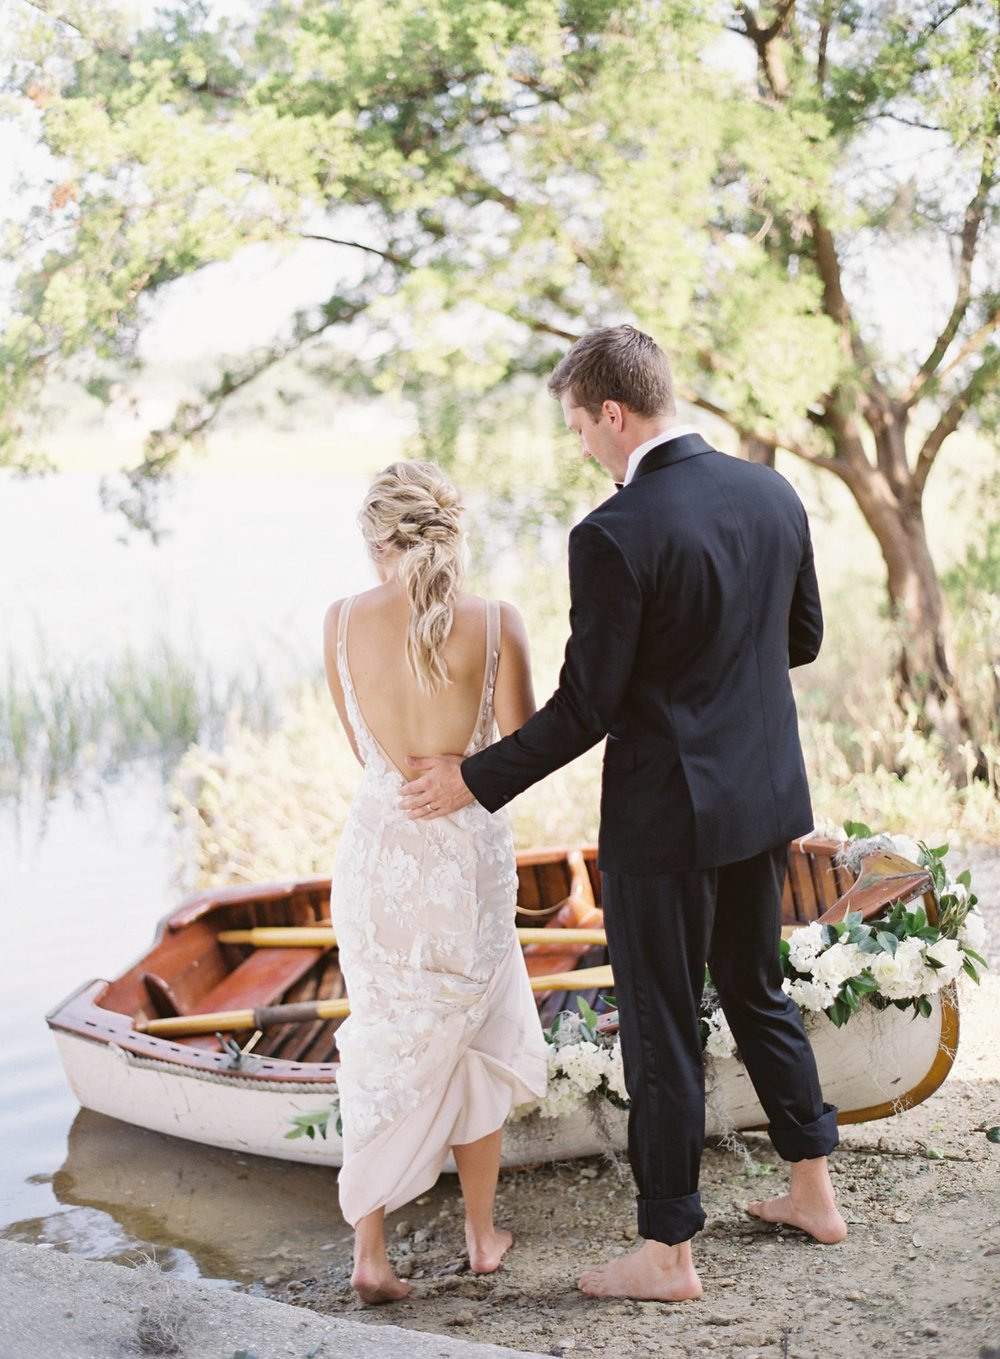 boonehallplantation_wedding_14.jpg